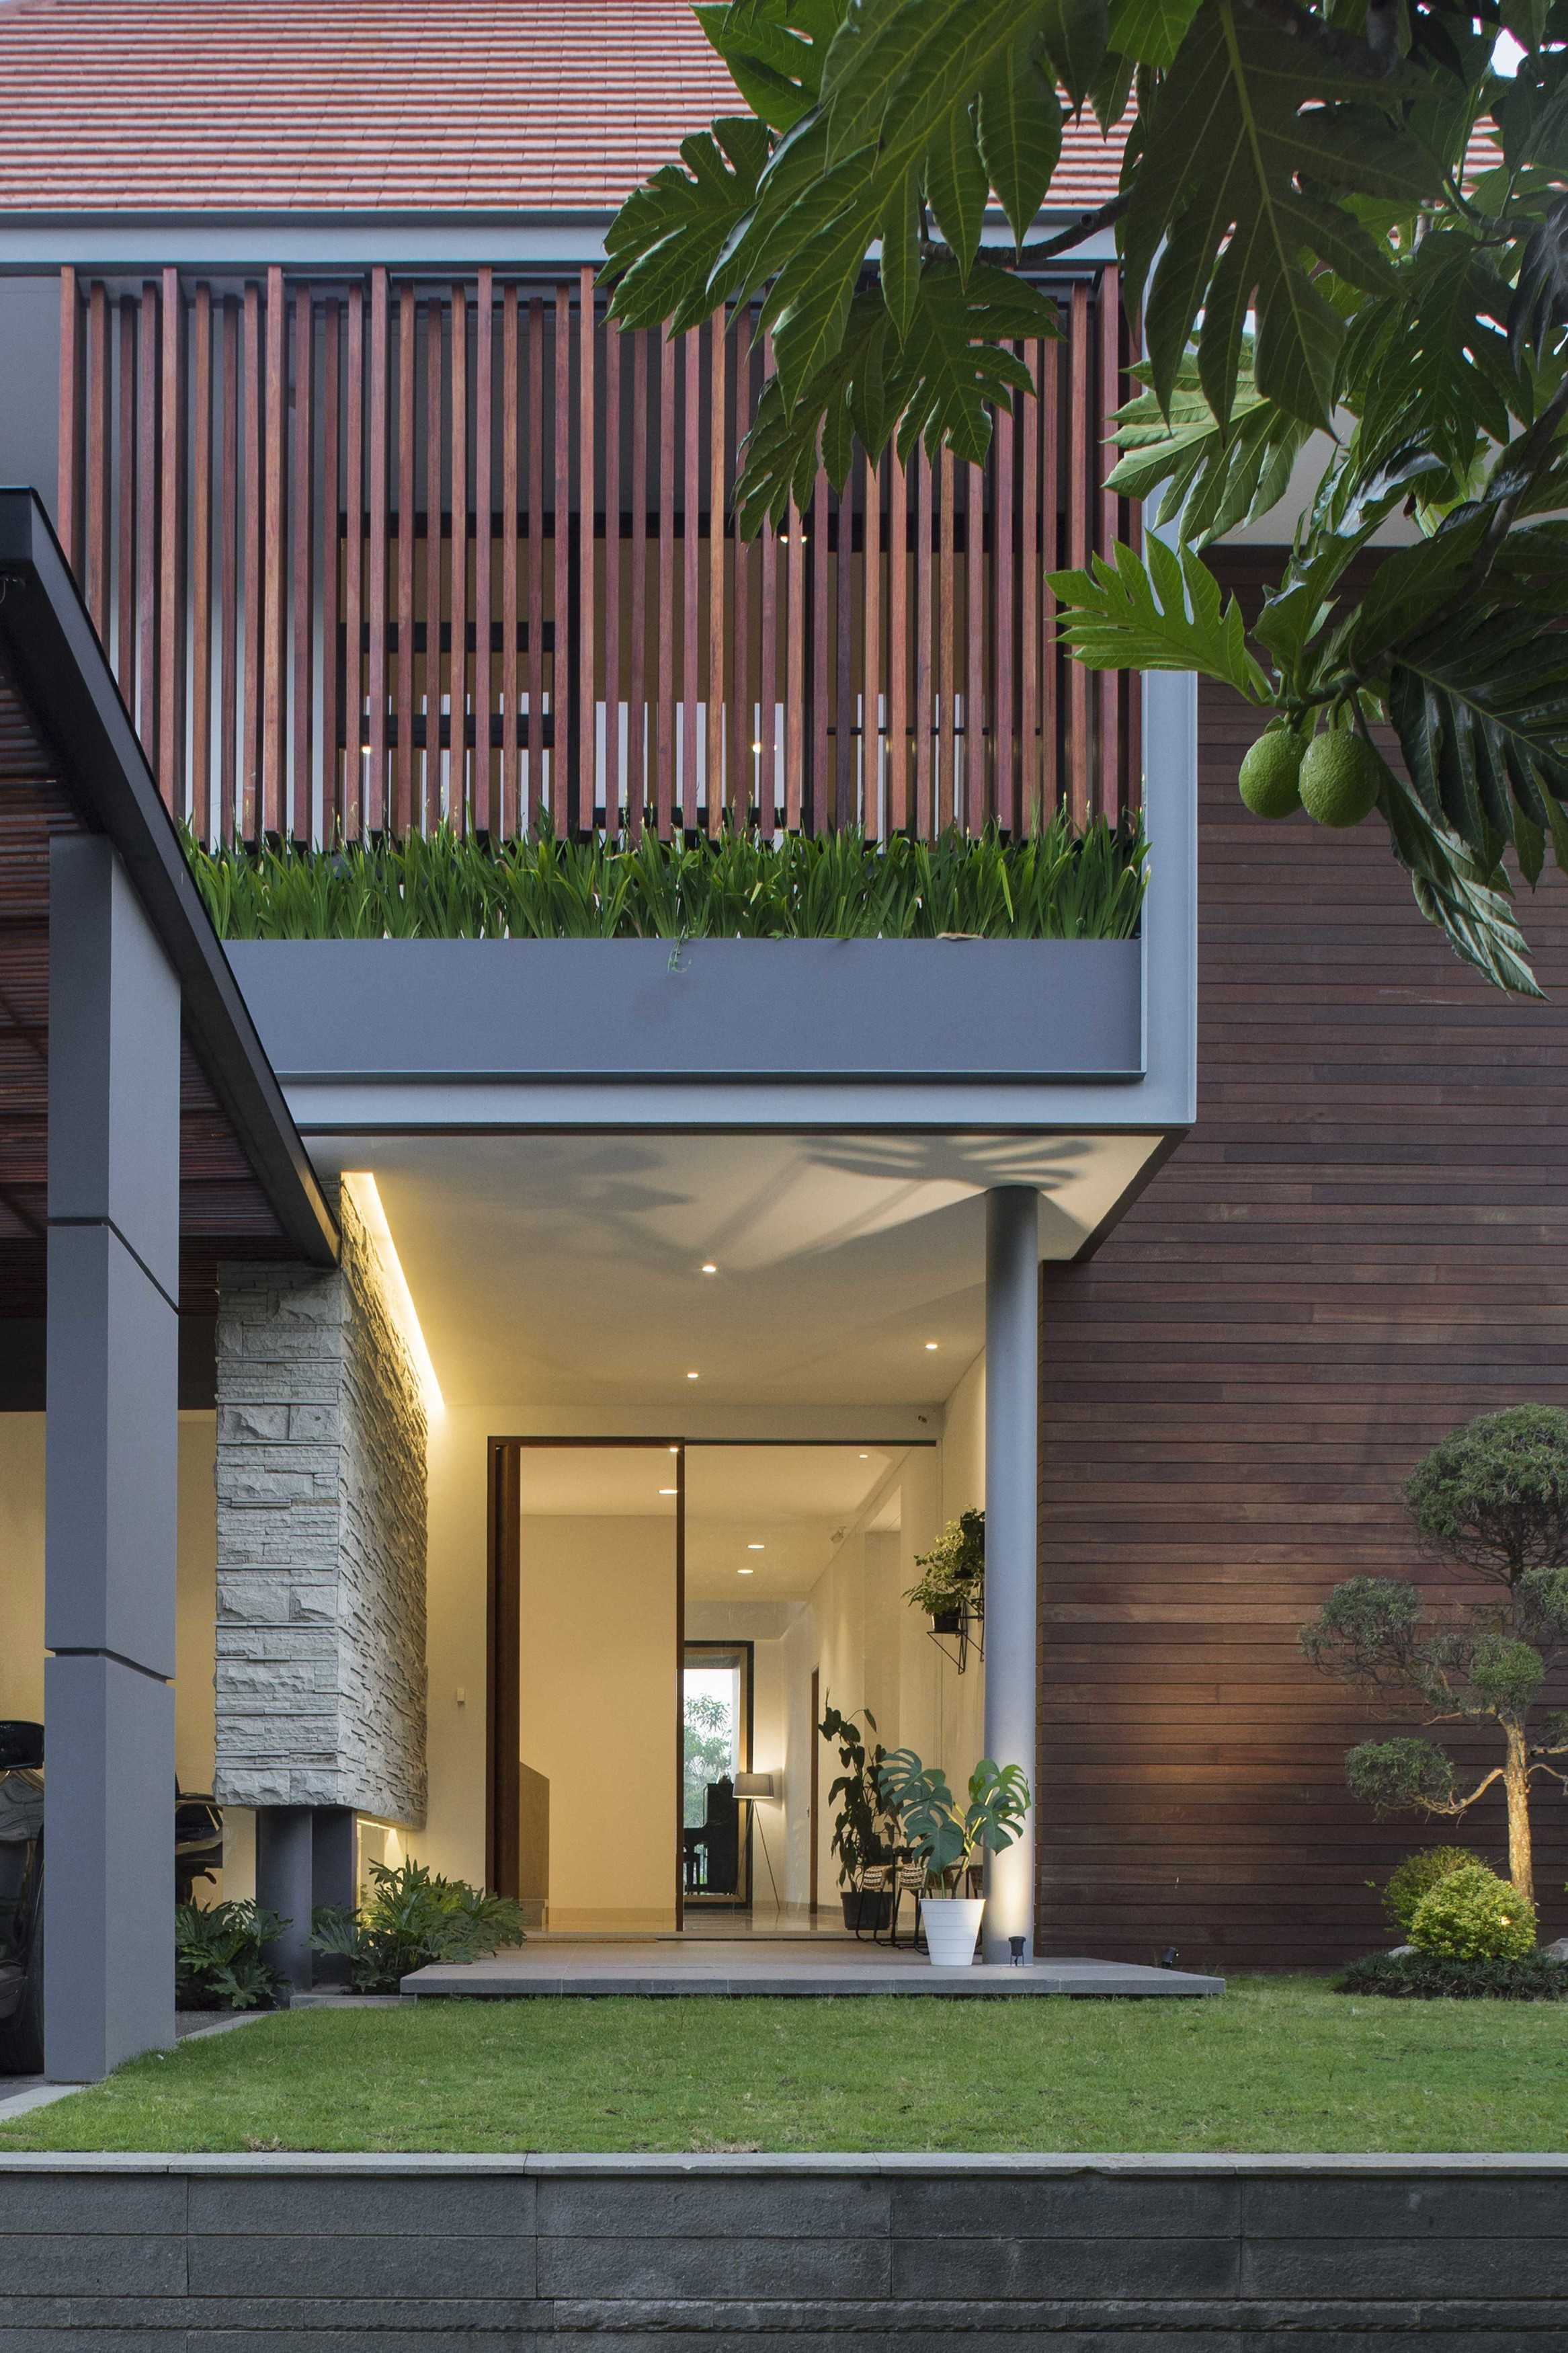 Erwin Kusuma Pitarani House Jalan Parahyangan No.42, Kertajaya, Padalarang, Kertajaya, Padalarang, Kabupaten Bandung Barat, Jawa Barat 40553, Indonesia  Erwin-Kusuma-Pitarani-House   63912